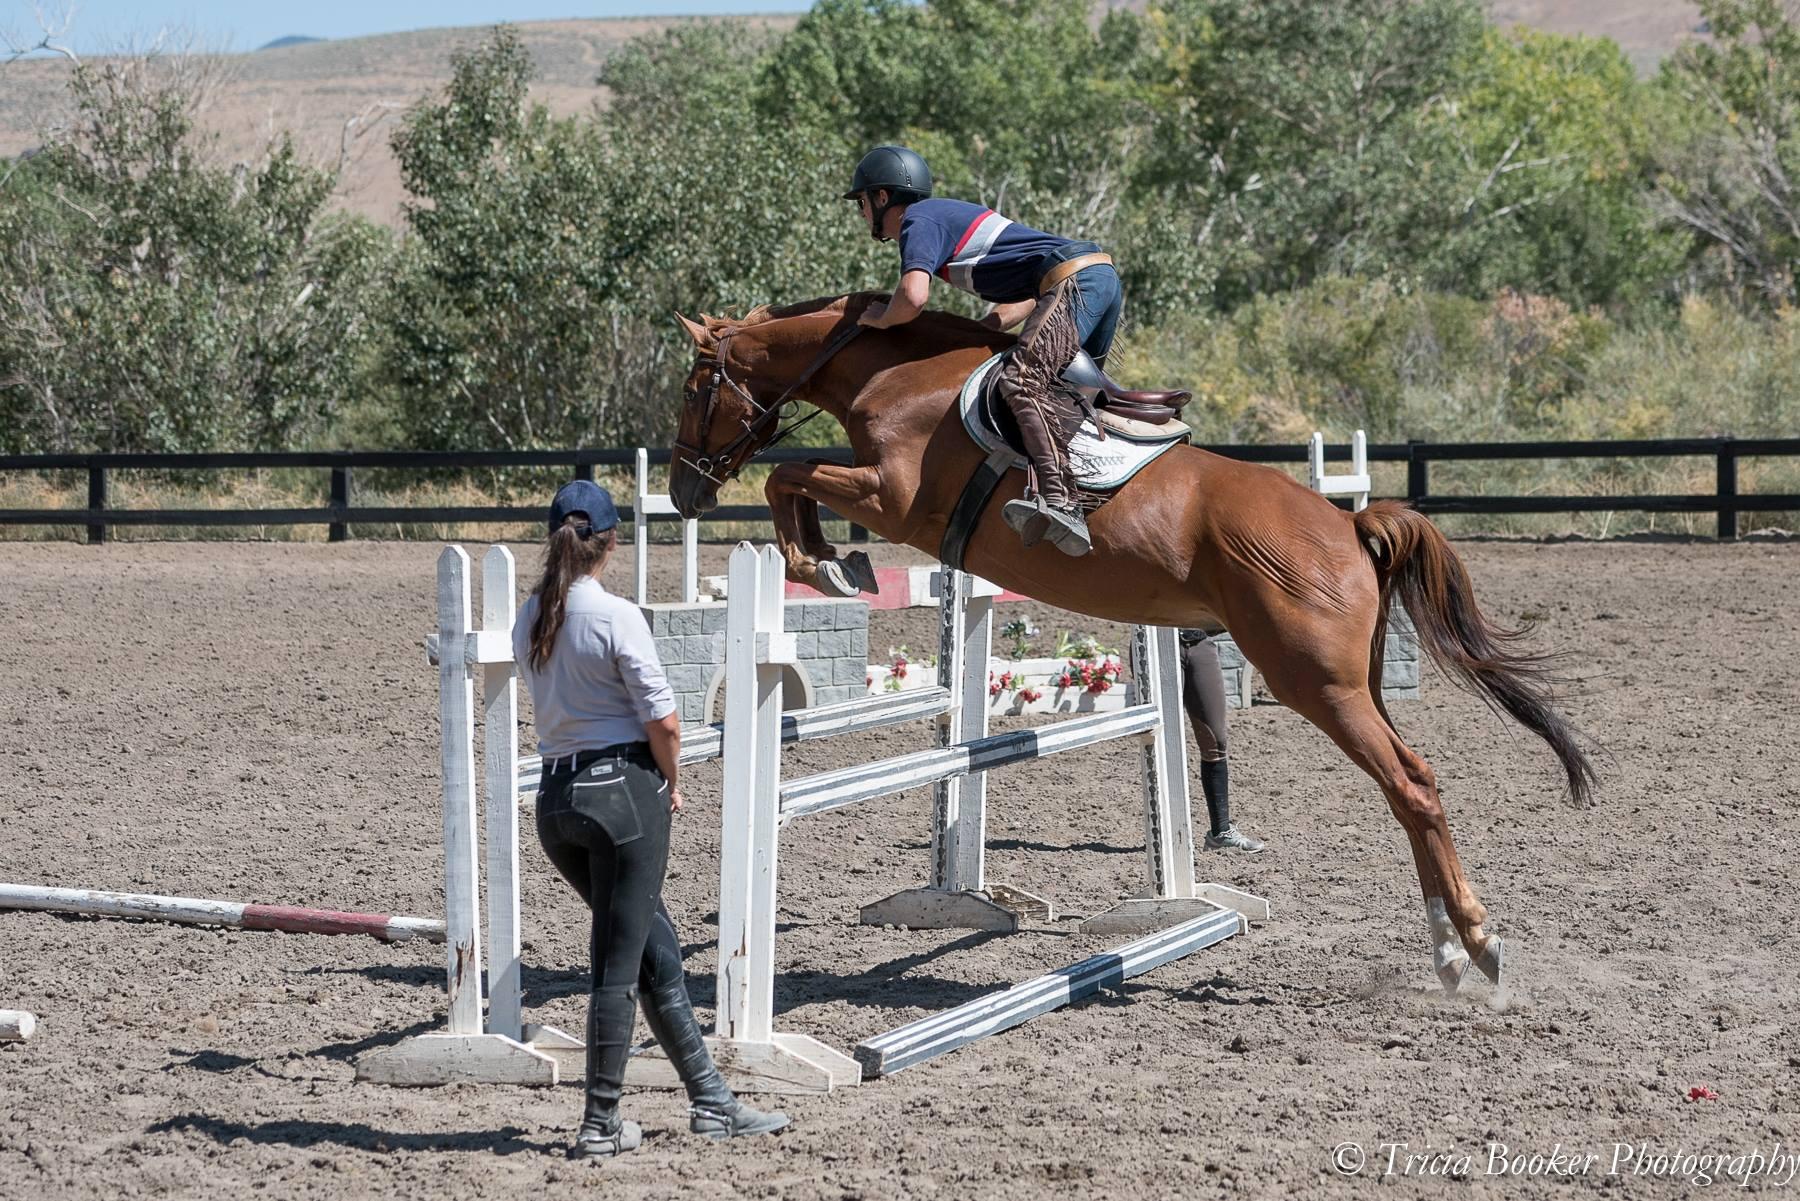 Maplewood's Horse Industry Training Program